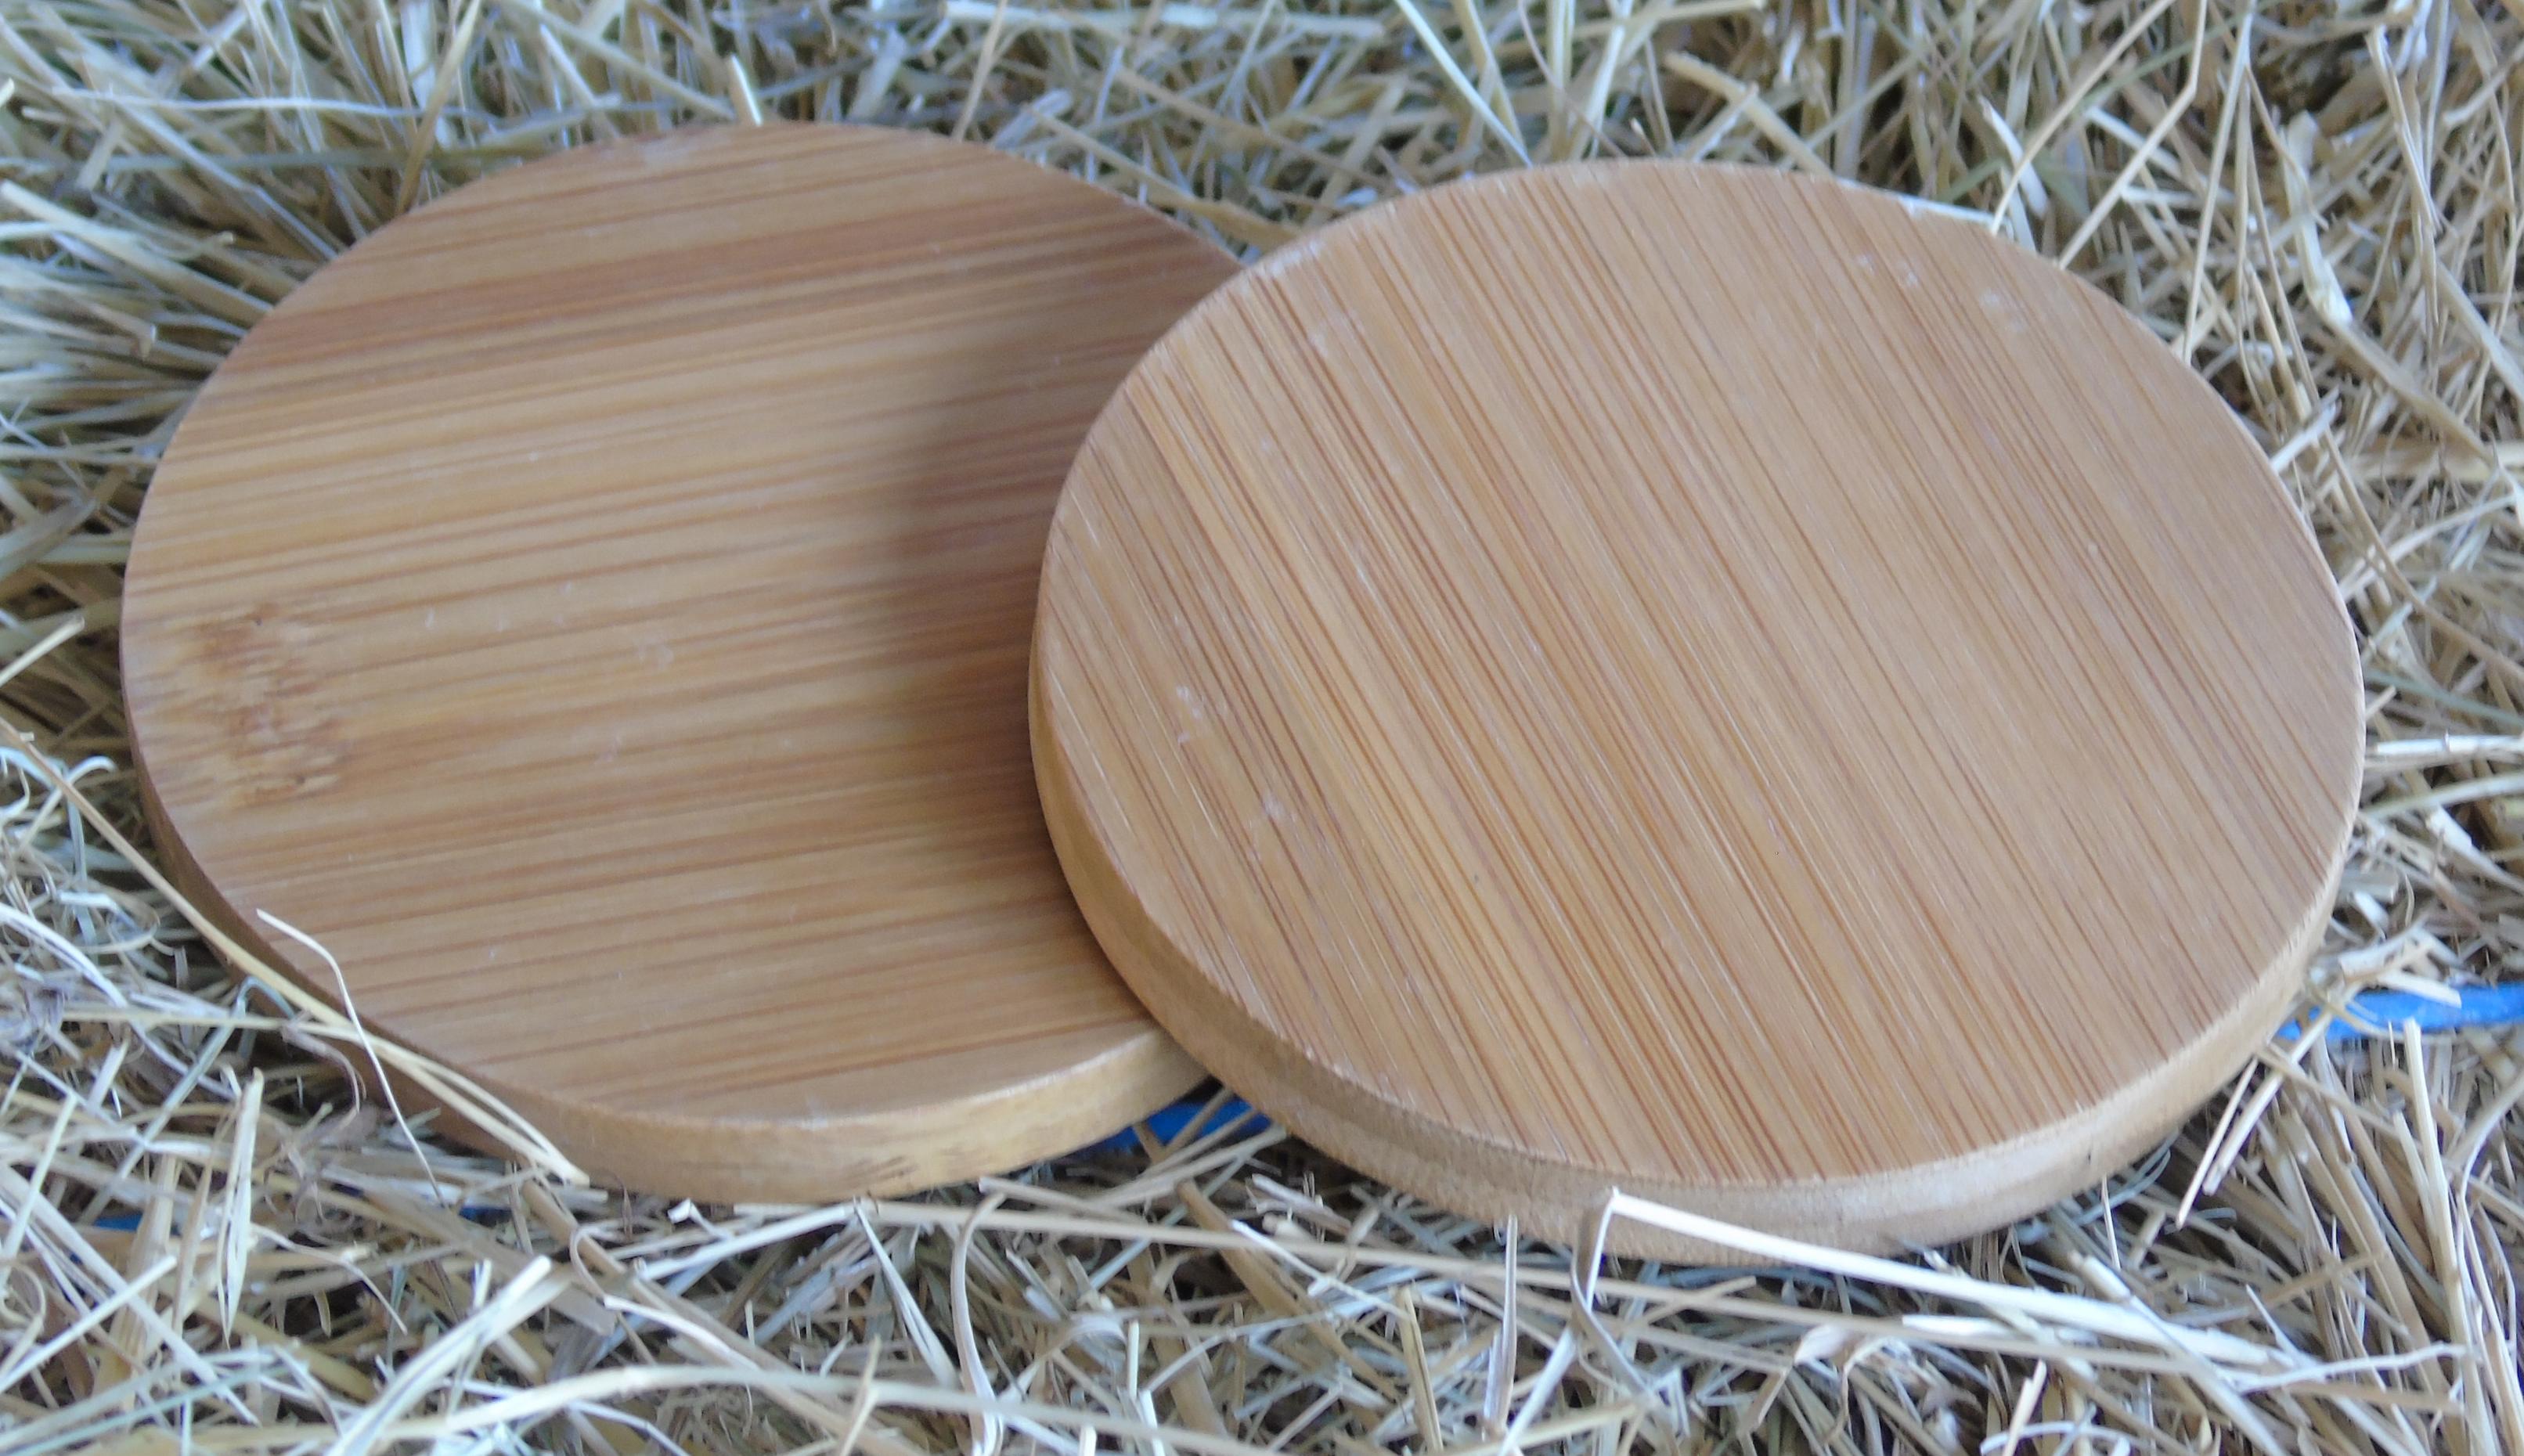 Bamboo wood coasters mini oak barrels for Best coasters for sweaty drinks